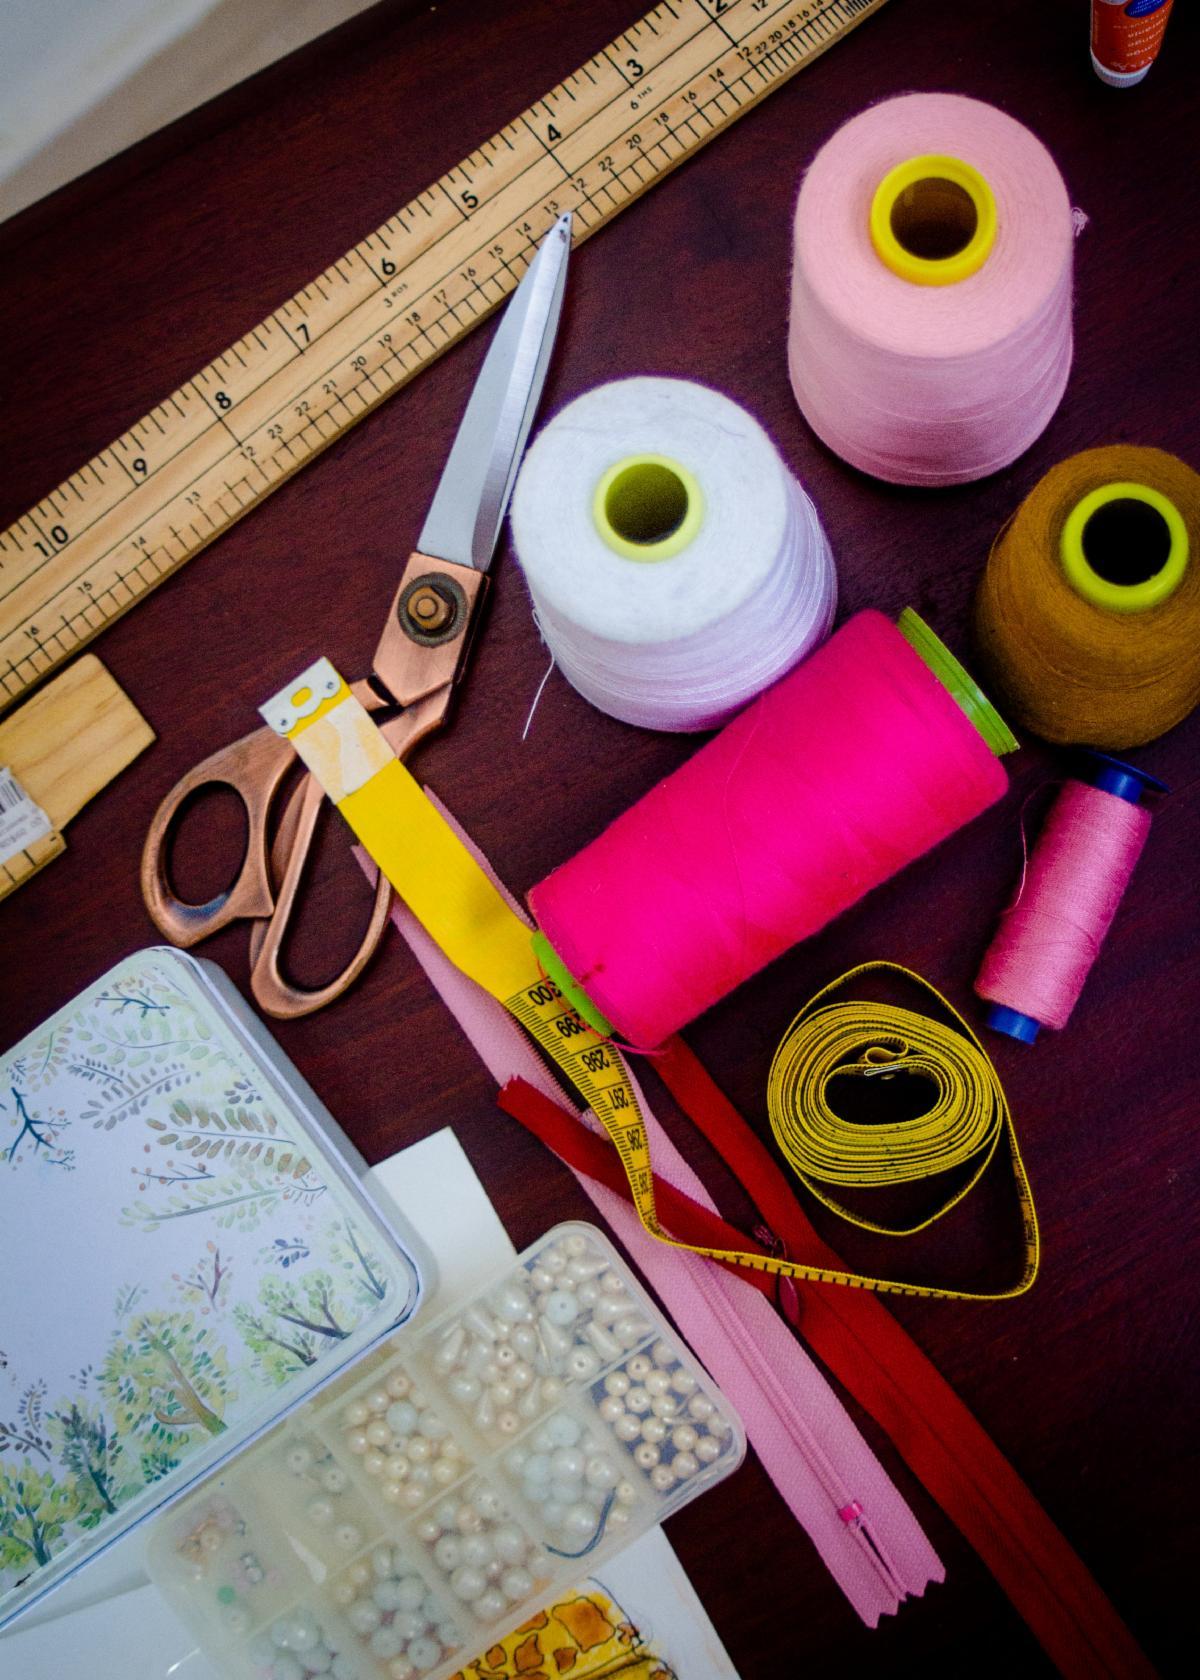 Photo of various craft supplies